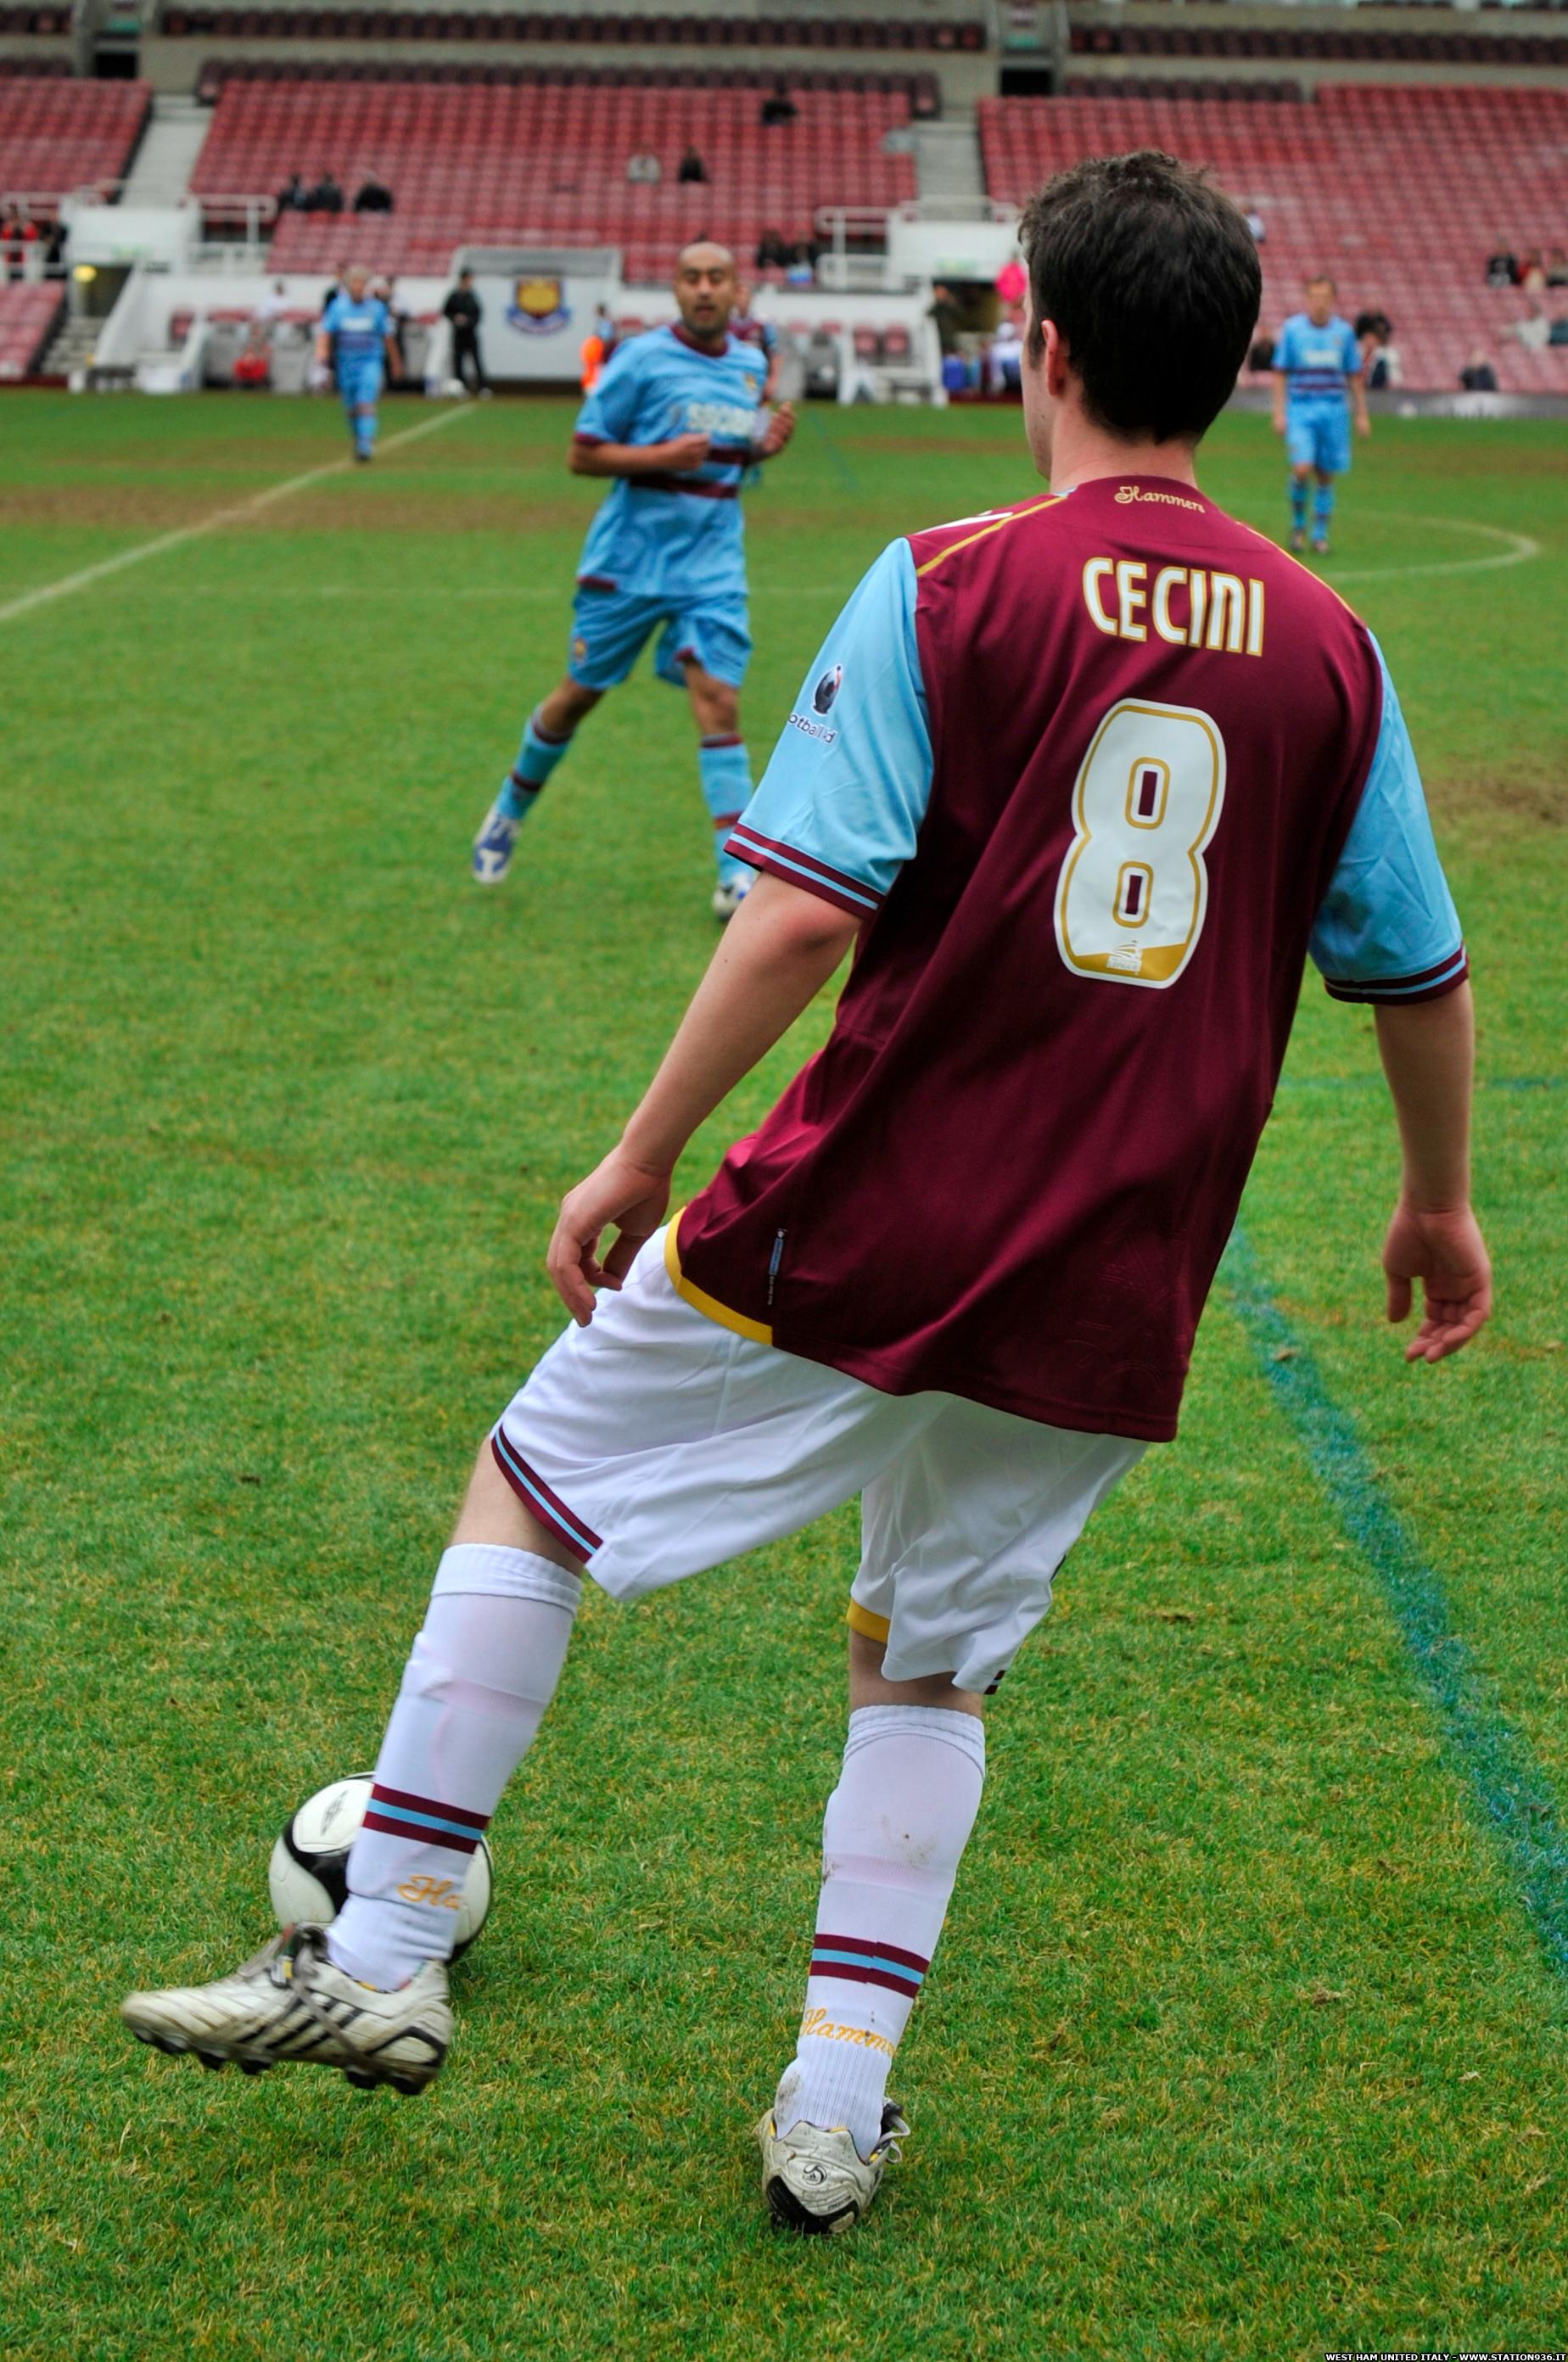 Partita Upton Park Boleyn Ground Station 936 tifosi italiani West Ham United 10